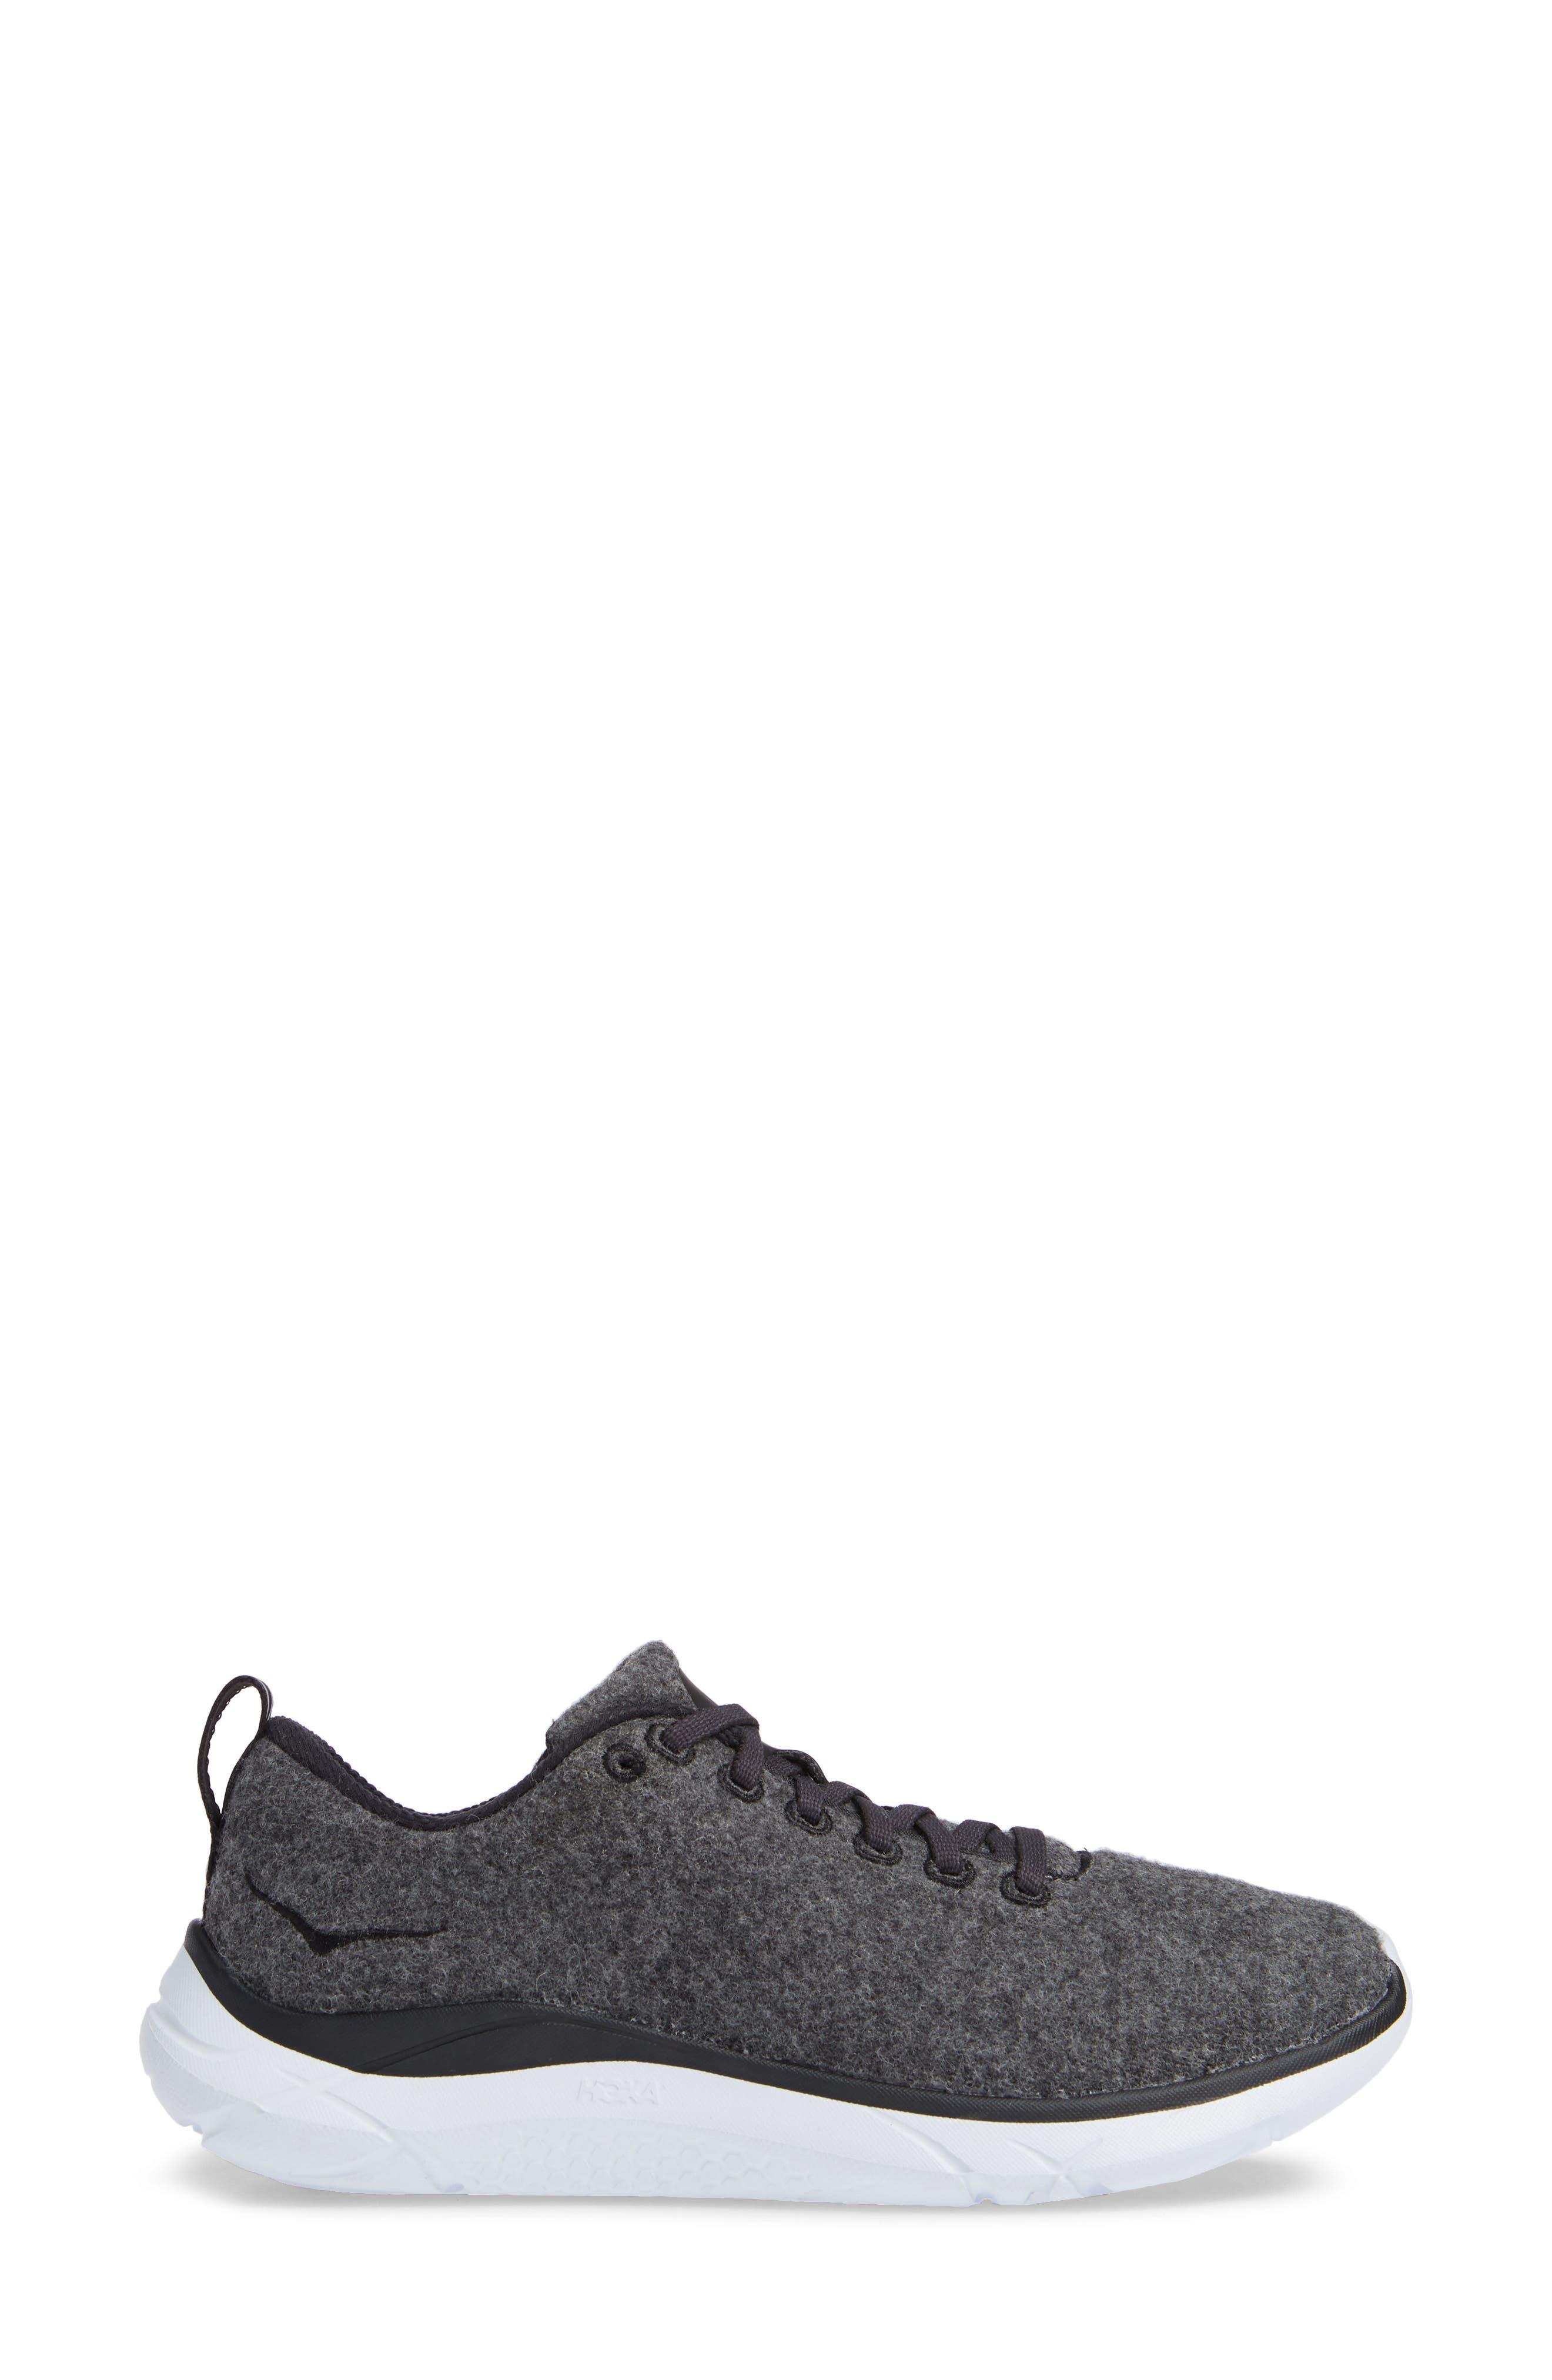 HOKA ONE ONE,                              Hupana Wool Sneaker,                             Alternate thumbnail 3, color,                             023